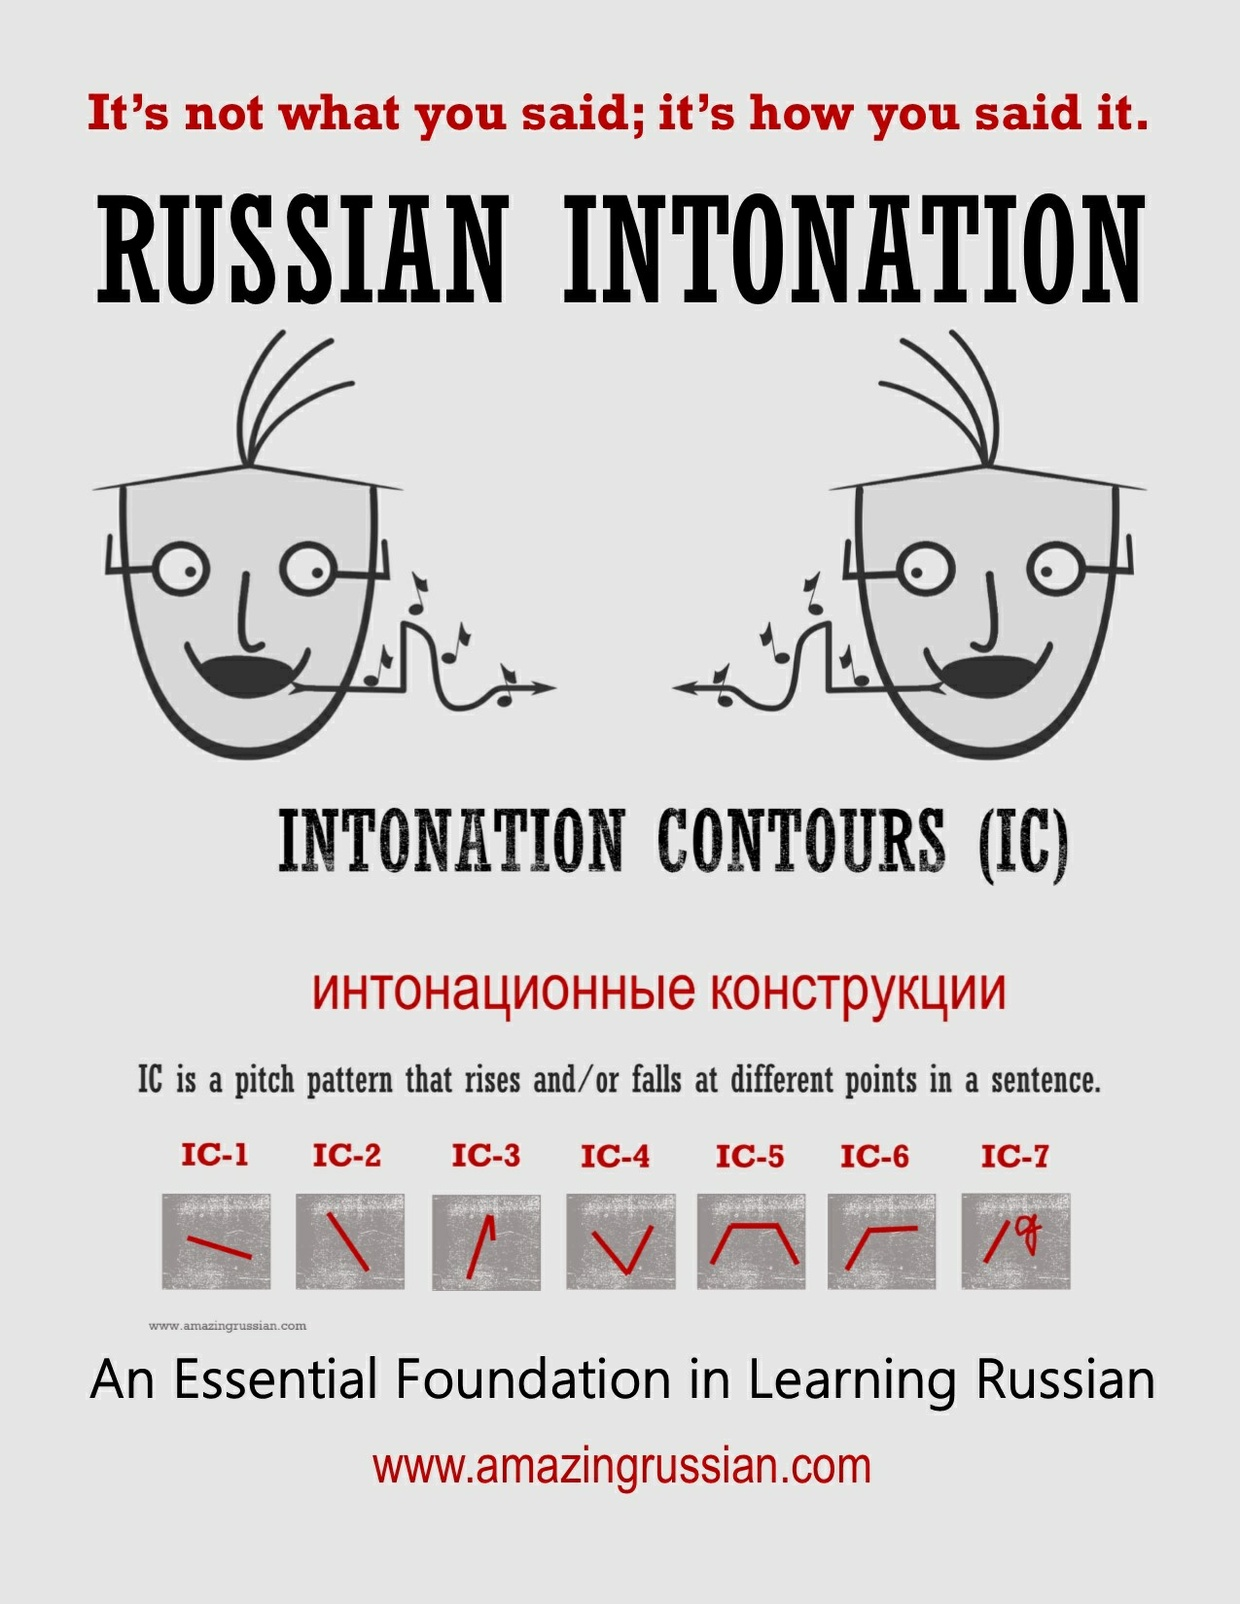 Russian Intonation Guide: Intonation Contours